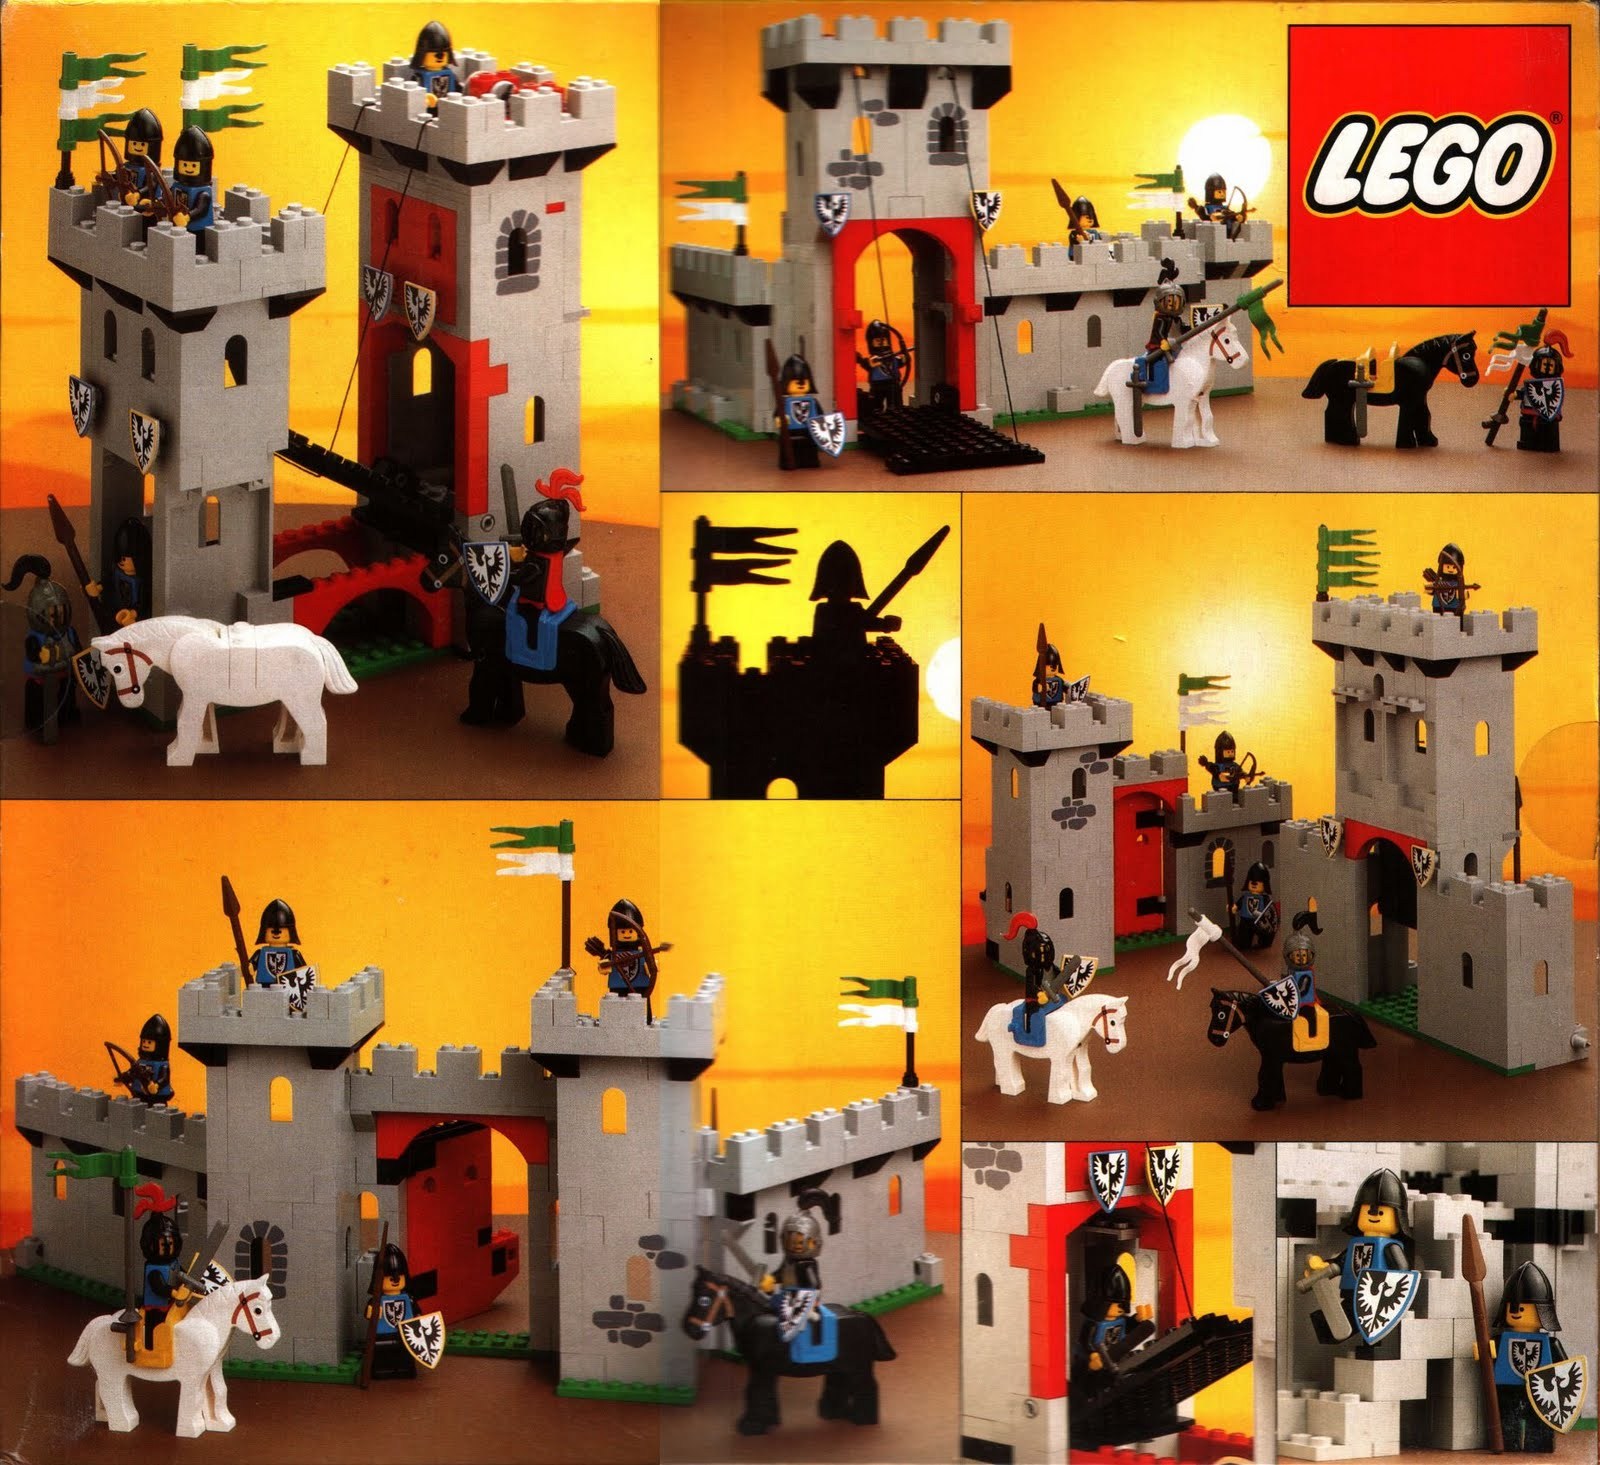 Displaying 19 Images For Lego Castle Sets 1990